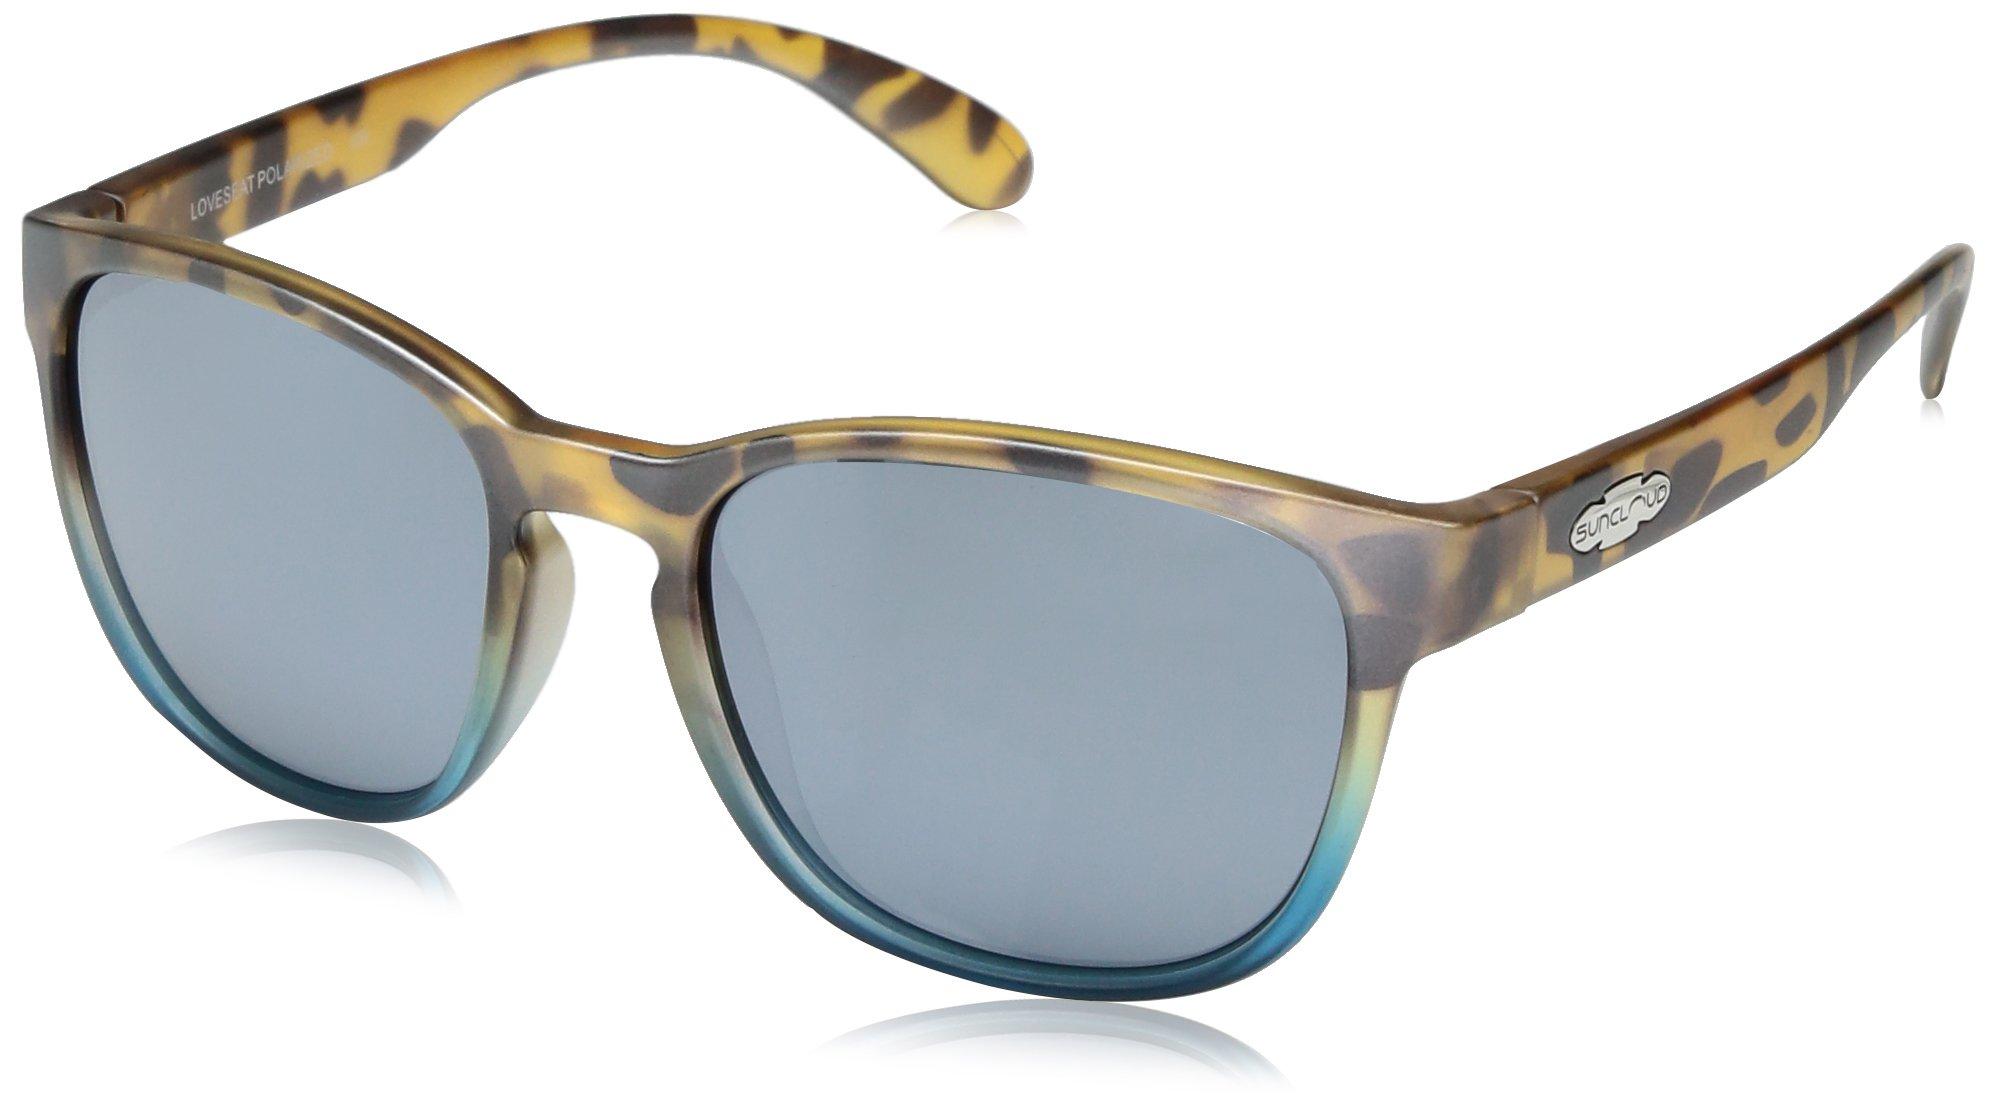 Suncloud Loveseat Sunglasses, Mt Tortoise Blue Fade Frame/Silver Mirror Polycarbonate Lens, One Size